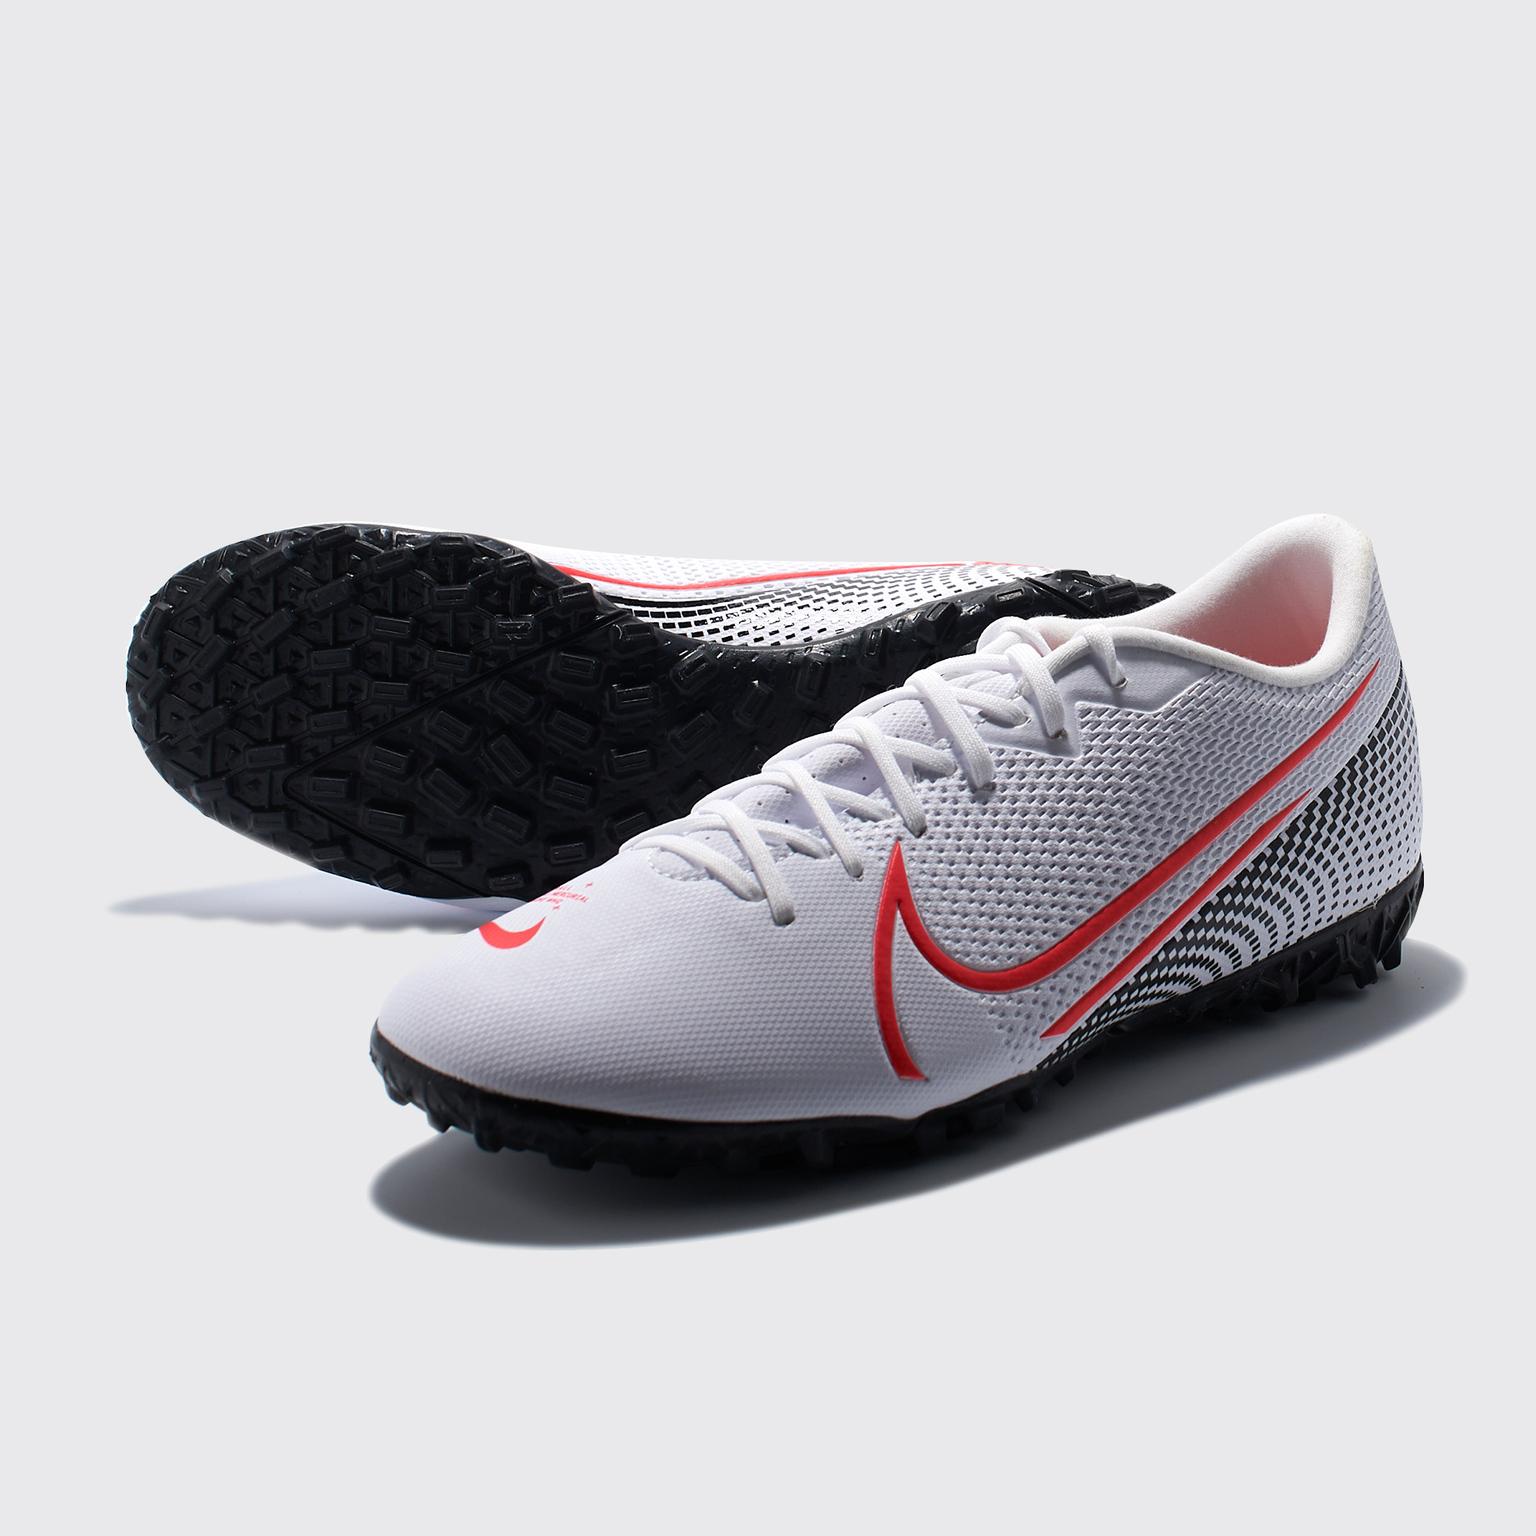 Фото - Шиповки Nike Vapor 13 Academy TF AT7996-160 шиповки детские nike vapor 13 academy neymar tf at8144 104